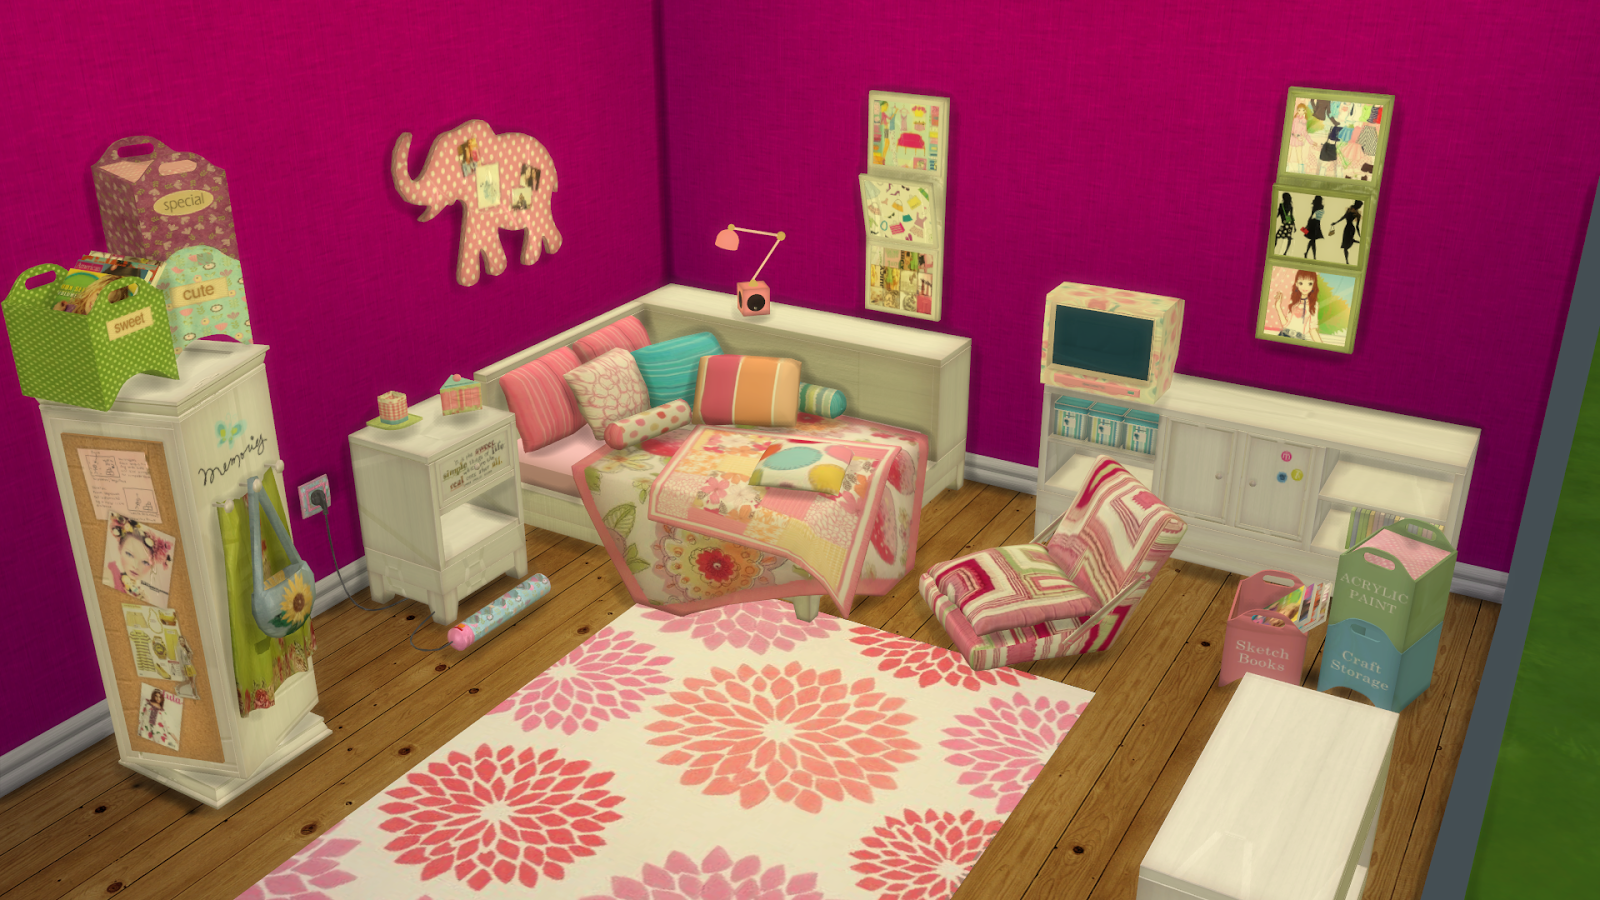 Sims 3 Design Garten Accessoires Inspirierend Anna Tropical Twist Room Ts2 to Ts4 Conversation